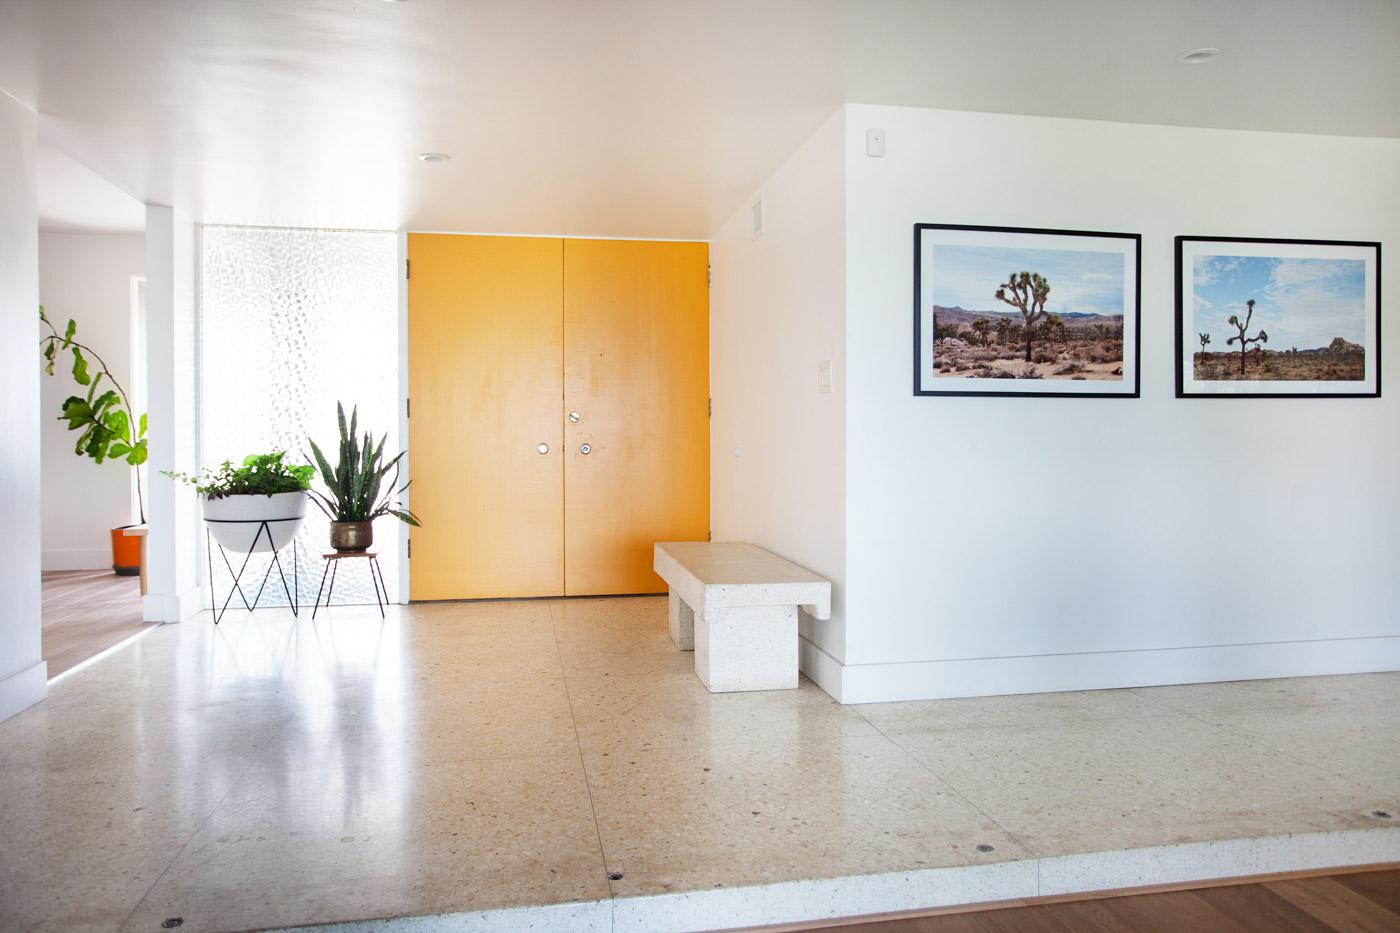 ModernDaze-LosAngelesCA-natural-light-photography-studio-lifestyle-photoshoot-location-editorial-commercial-photography-8.jpg